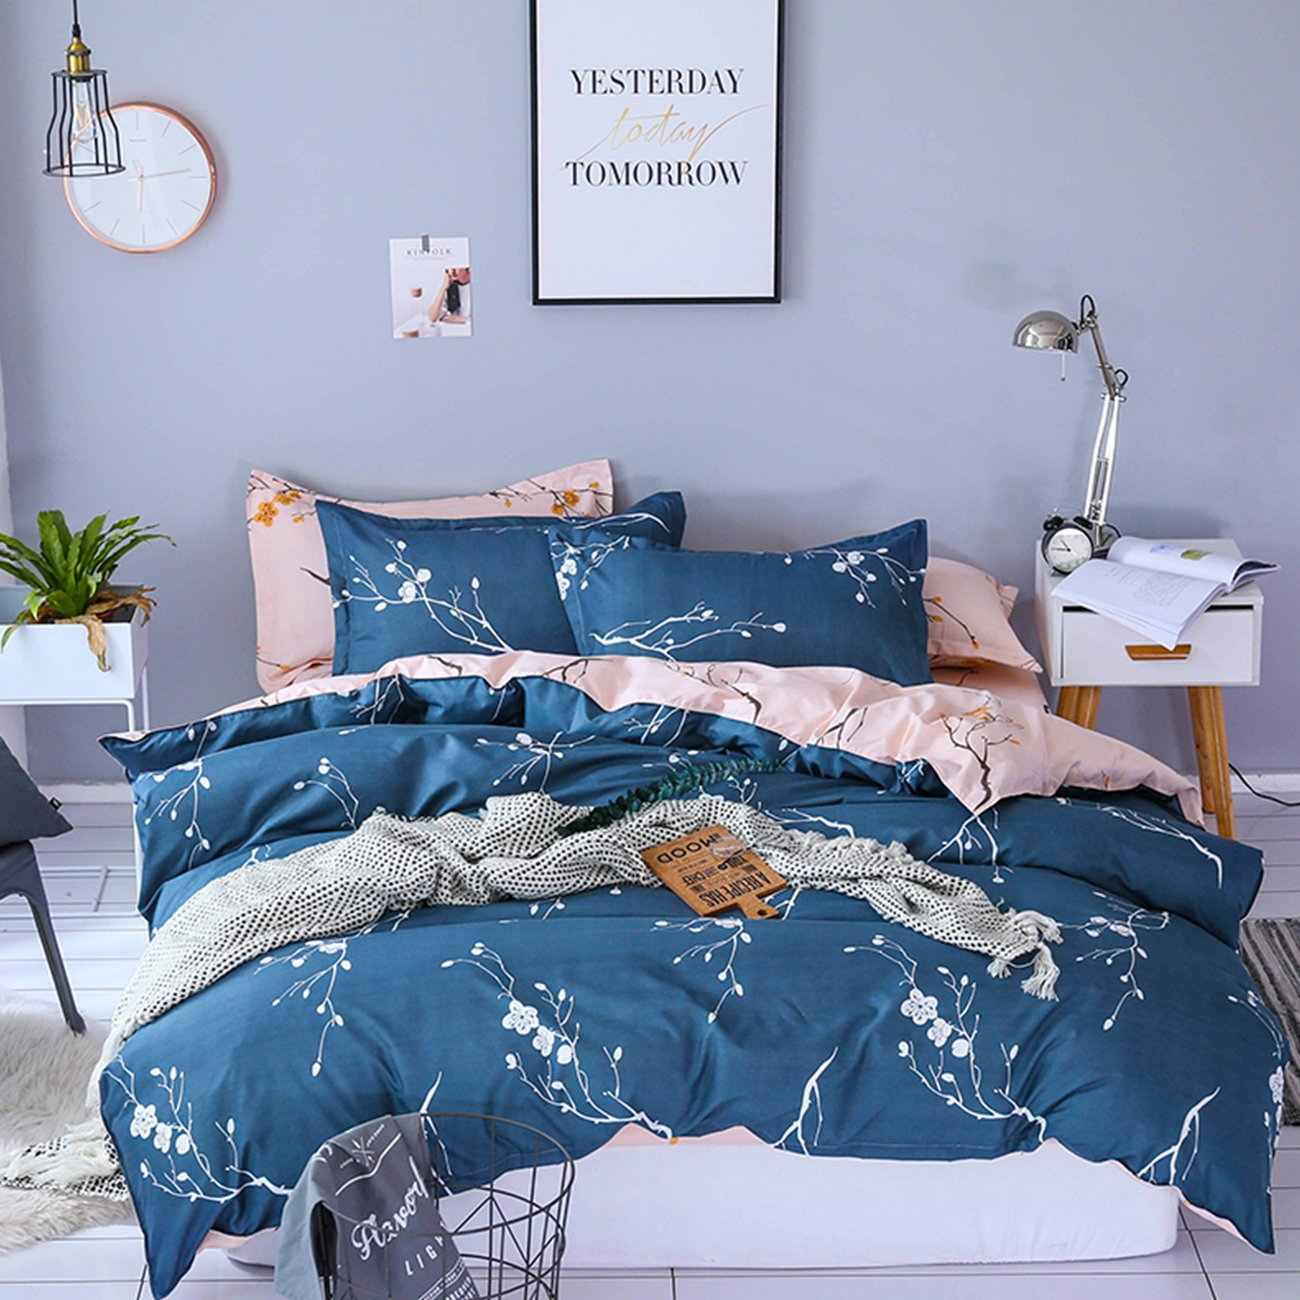 TanNicoor Plum blossom Printed Duvet Cover Set,Peach Pink Navy blue  Lightweight Microfiber 3-Pieces Reversible Bedding Set with Zipper  Closure-Queen